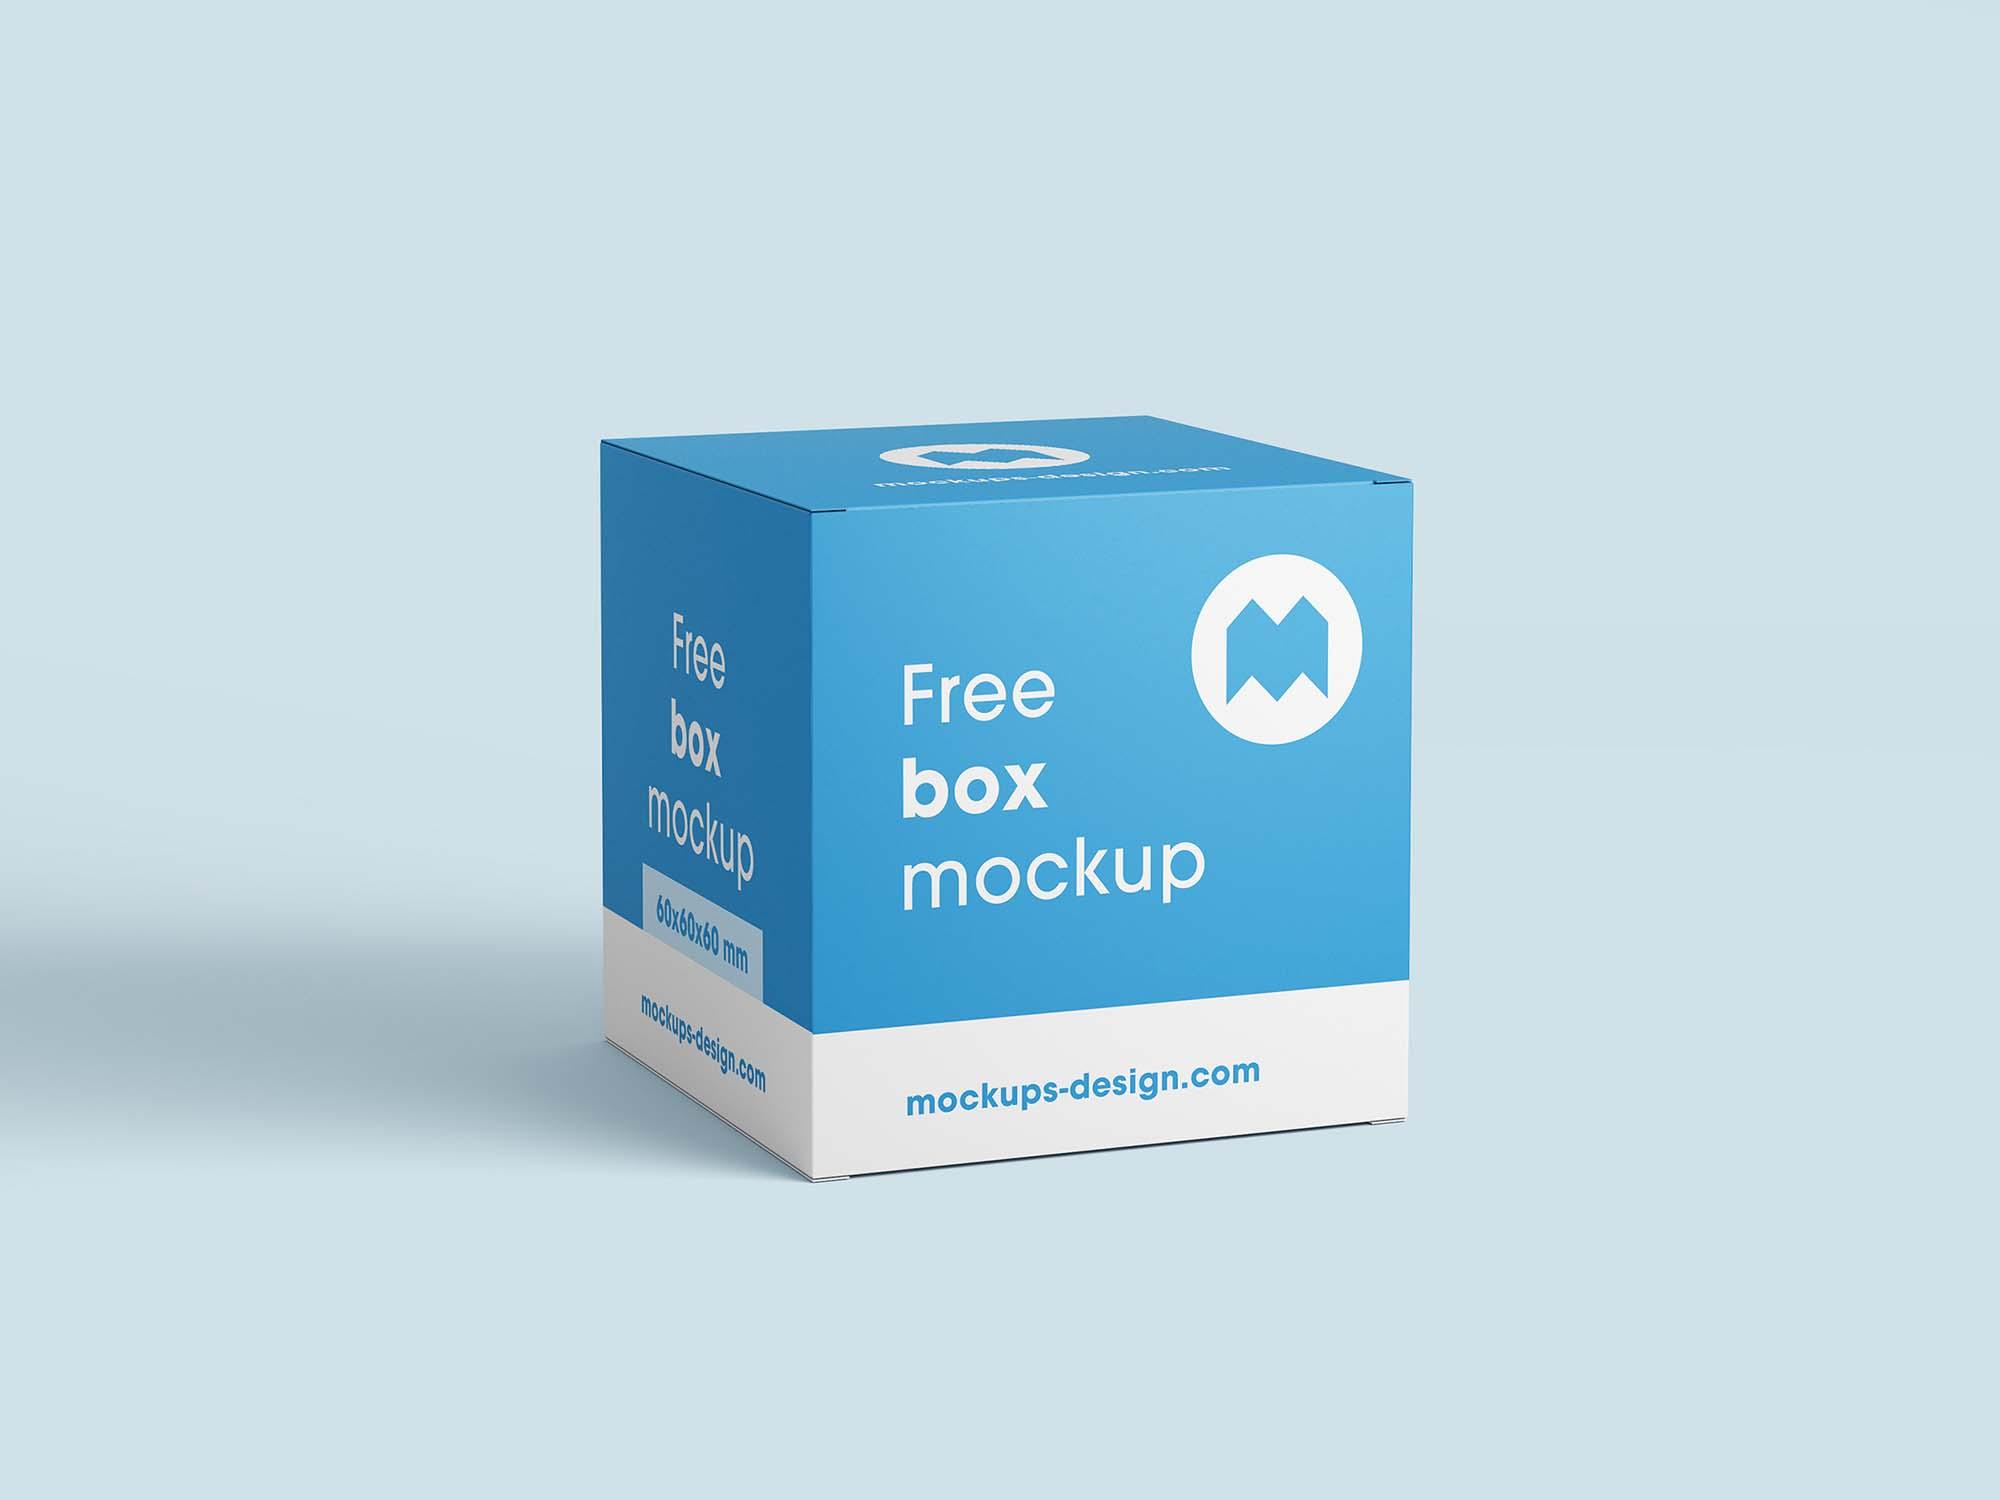 Square Boxes Mockup 2